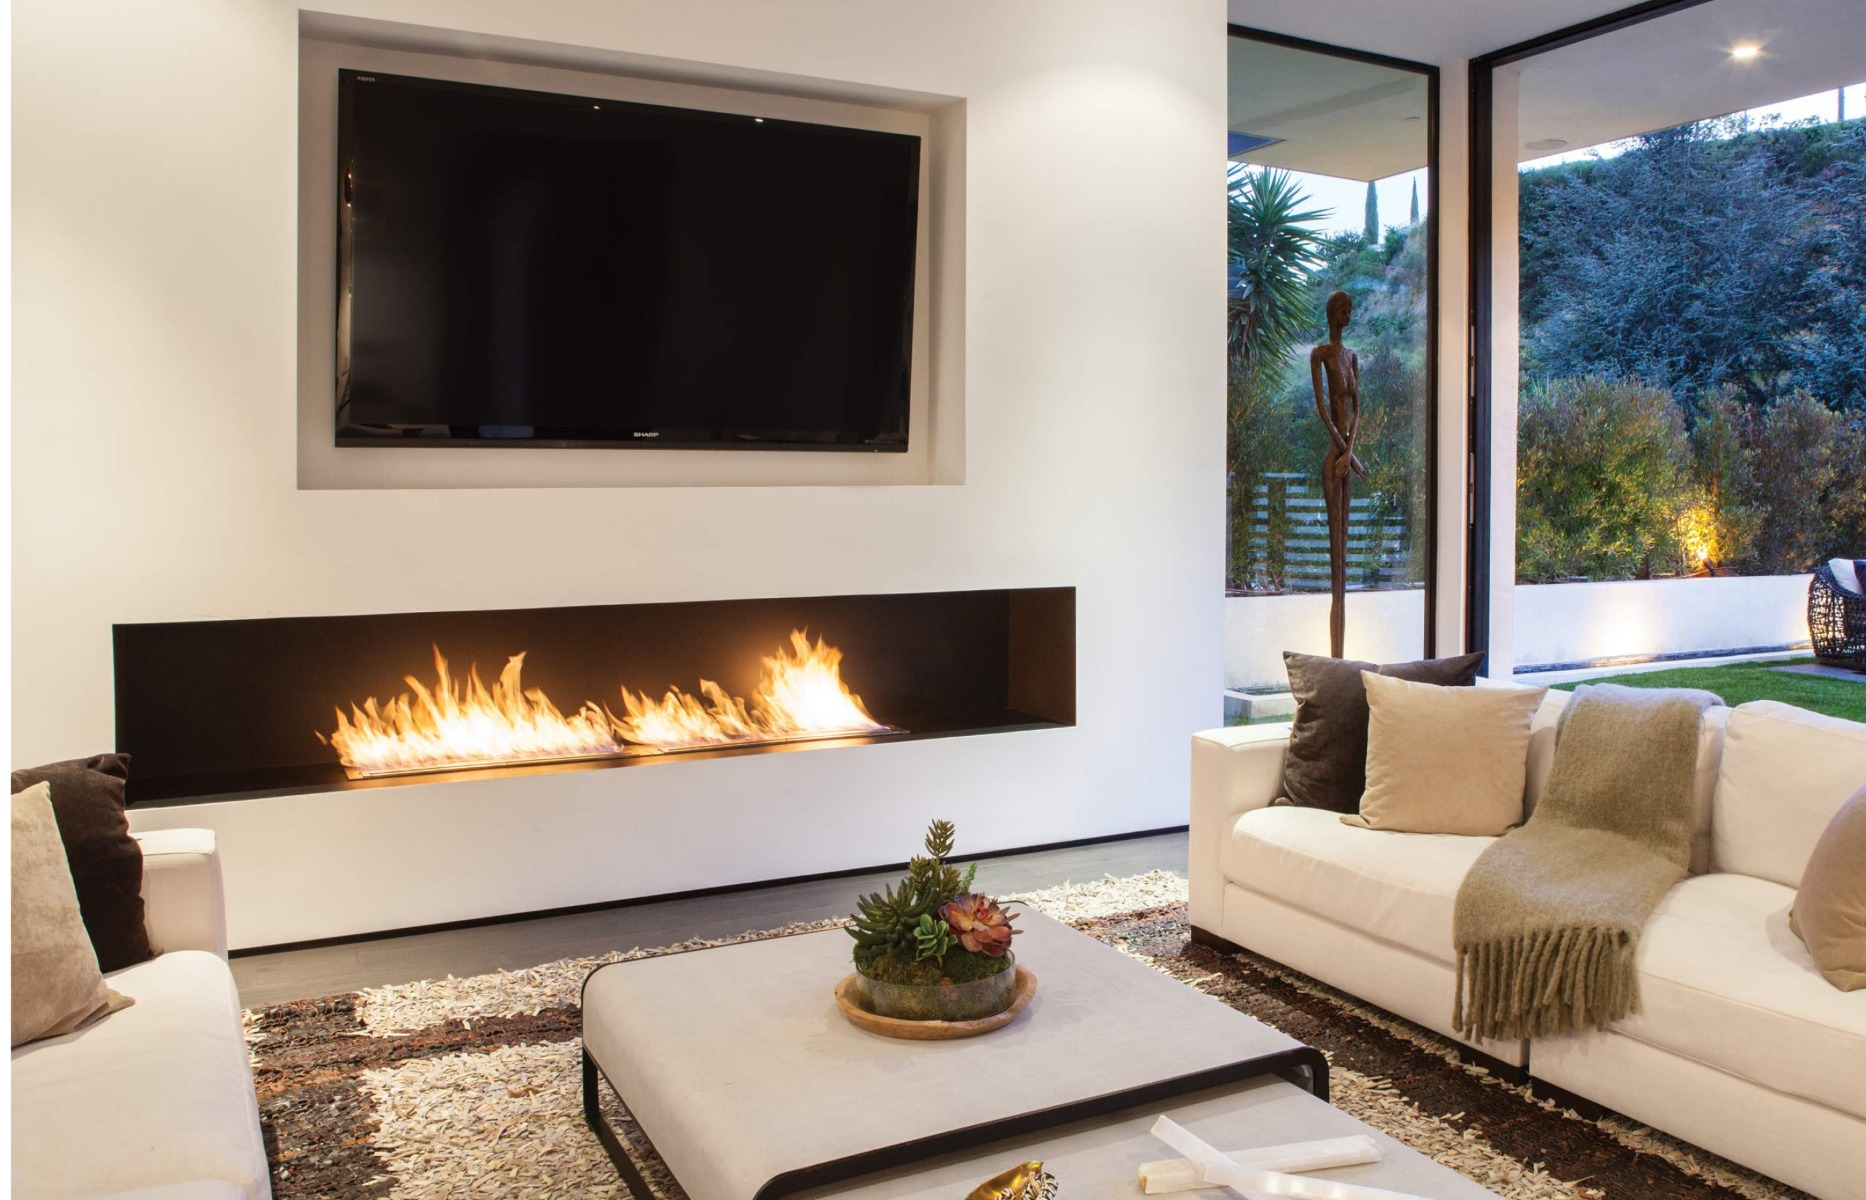 EcoSmart Fire XL900 ethanol burner custom fireplace insert